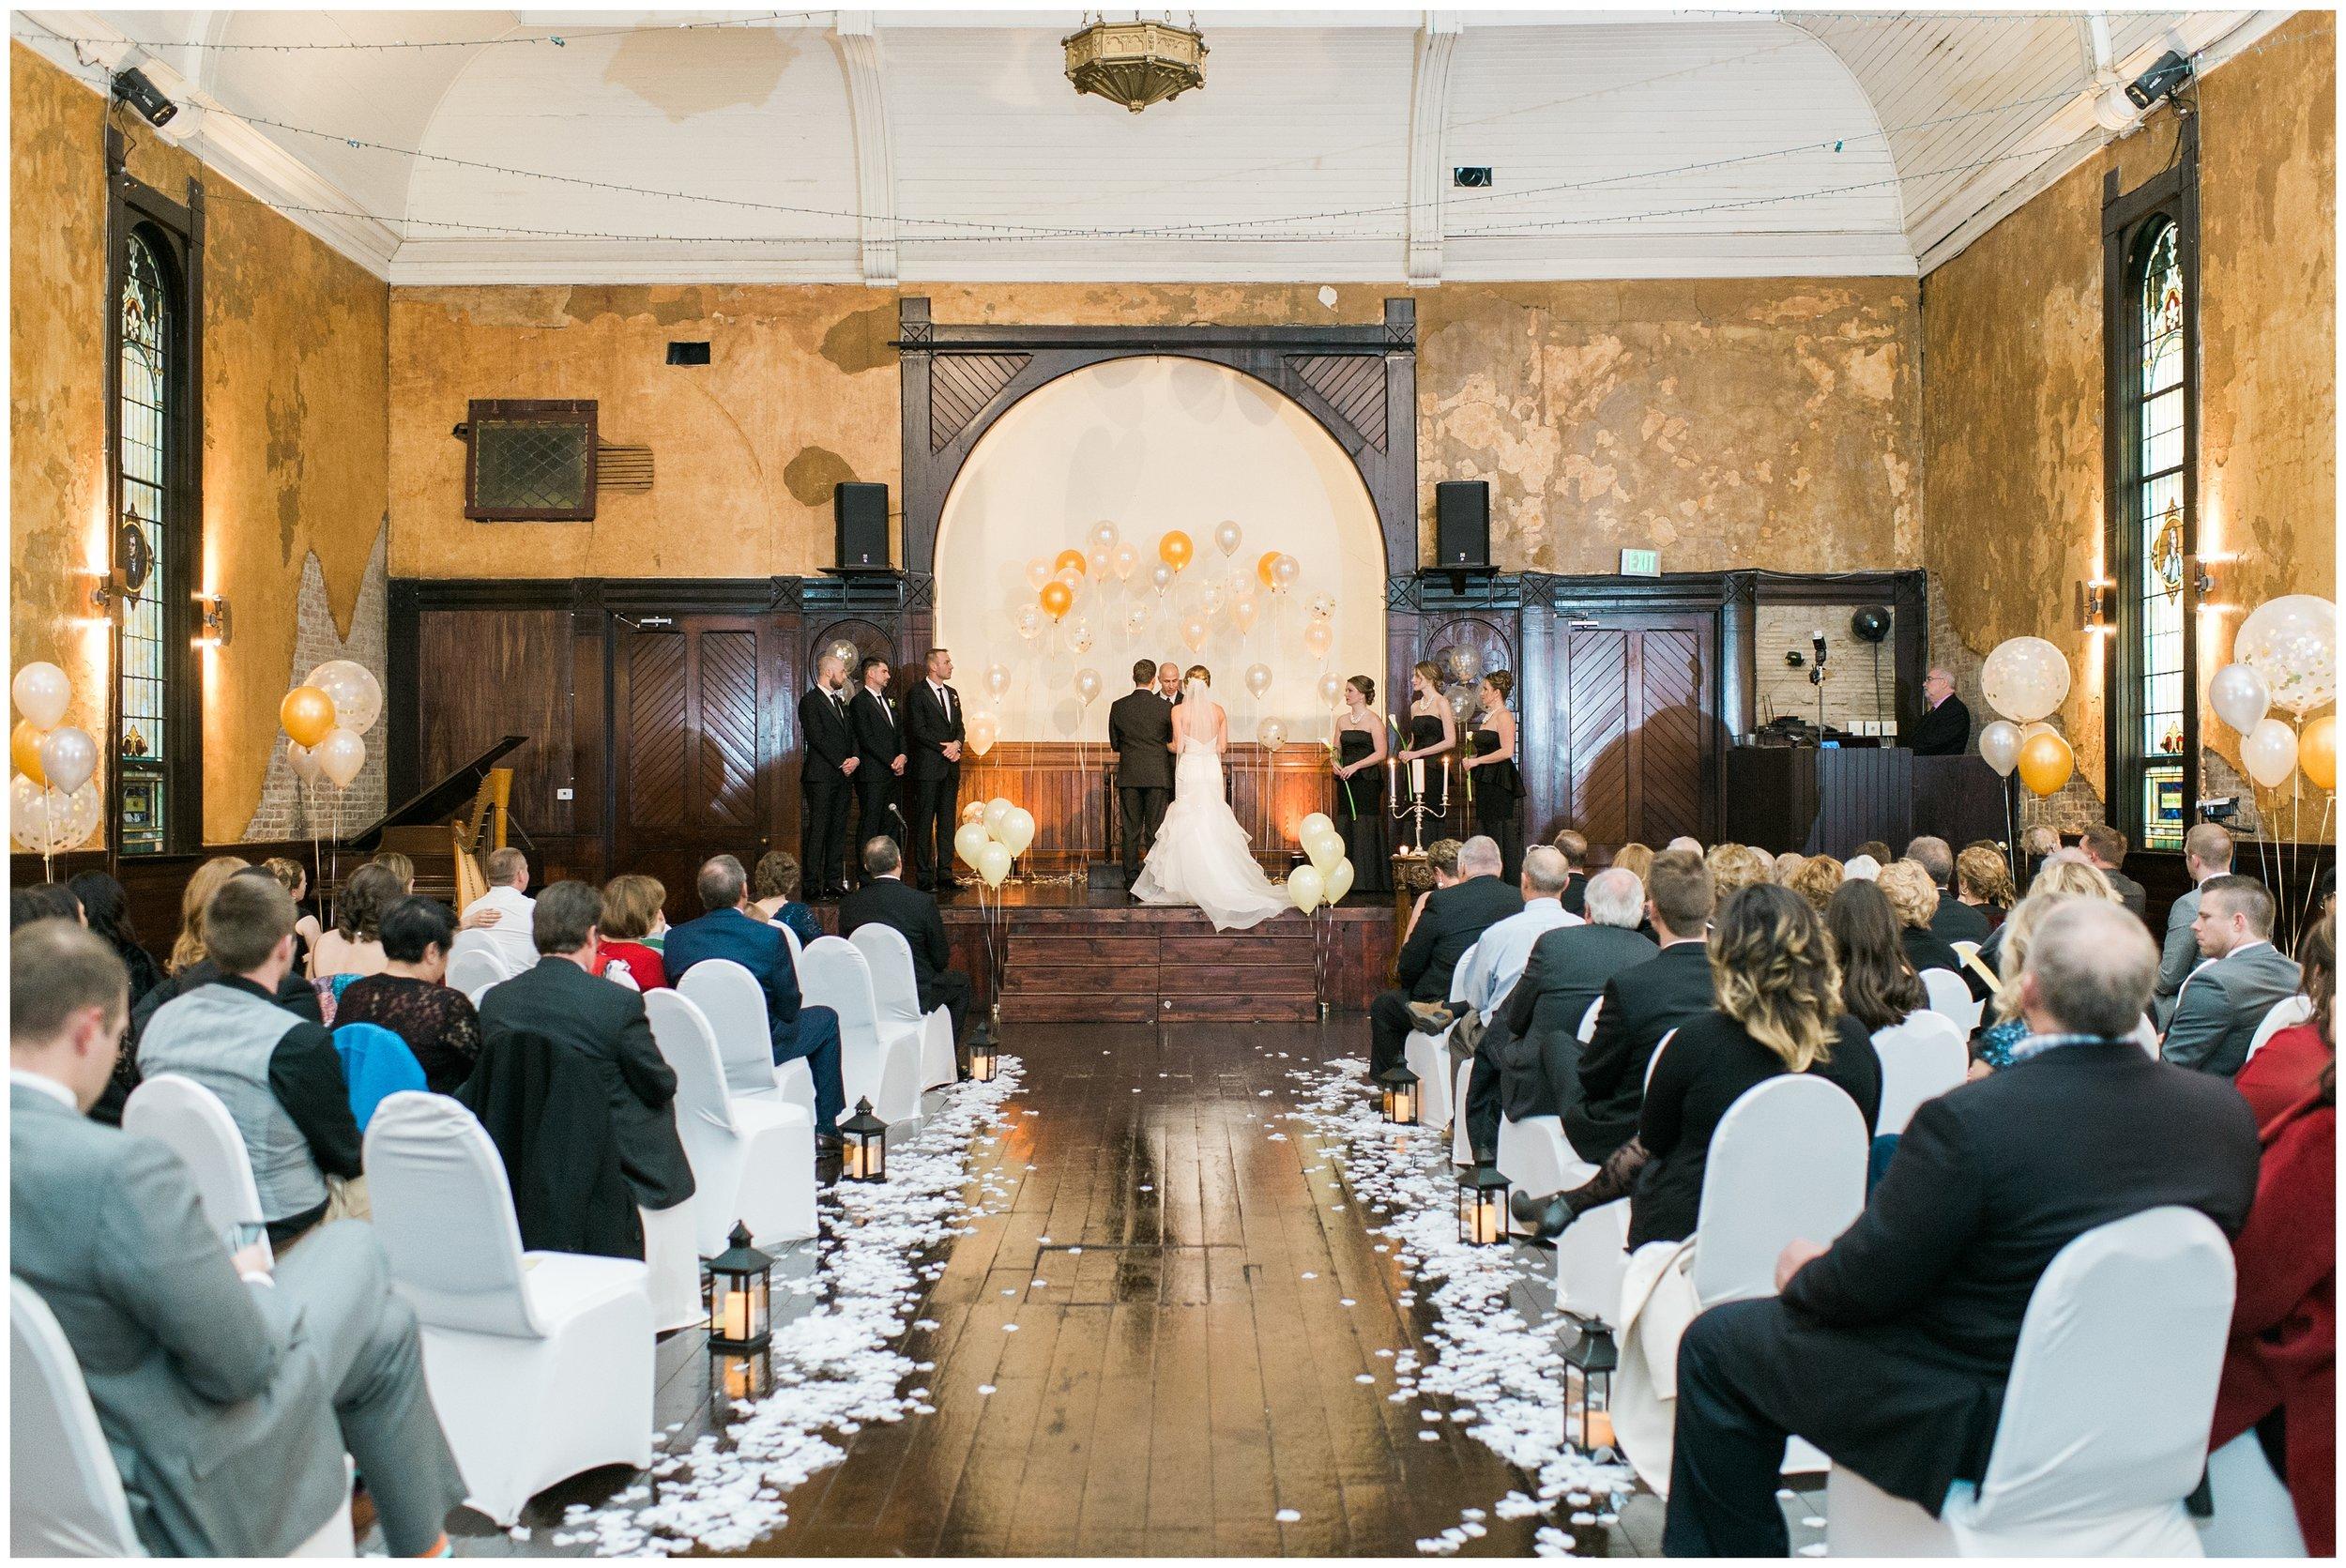 Rebecca_Bridges_Photography_Indianapolis_Wedding_Photographer_5831.jpg